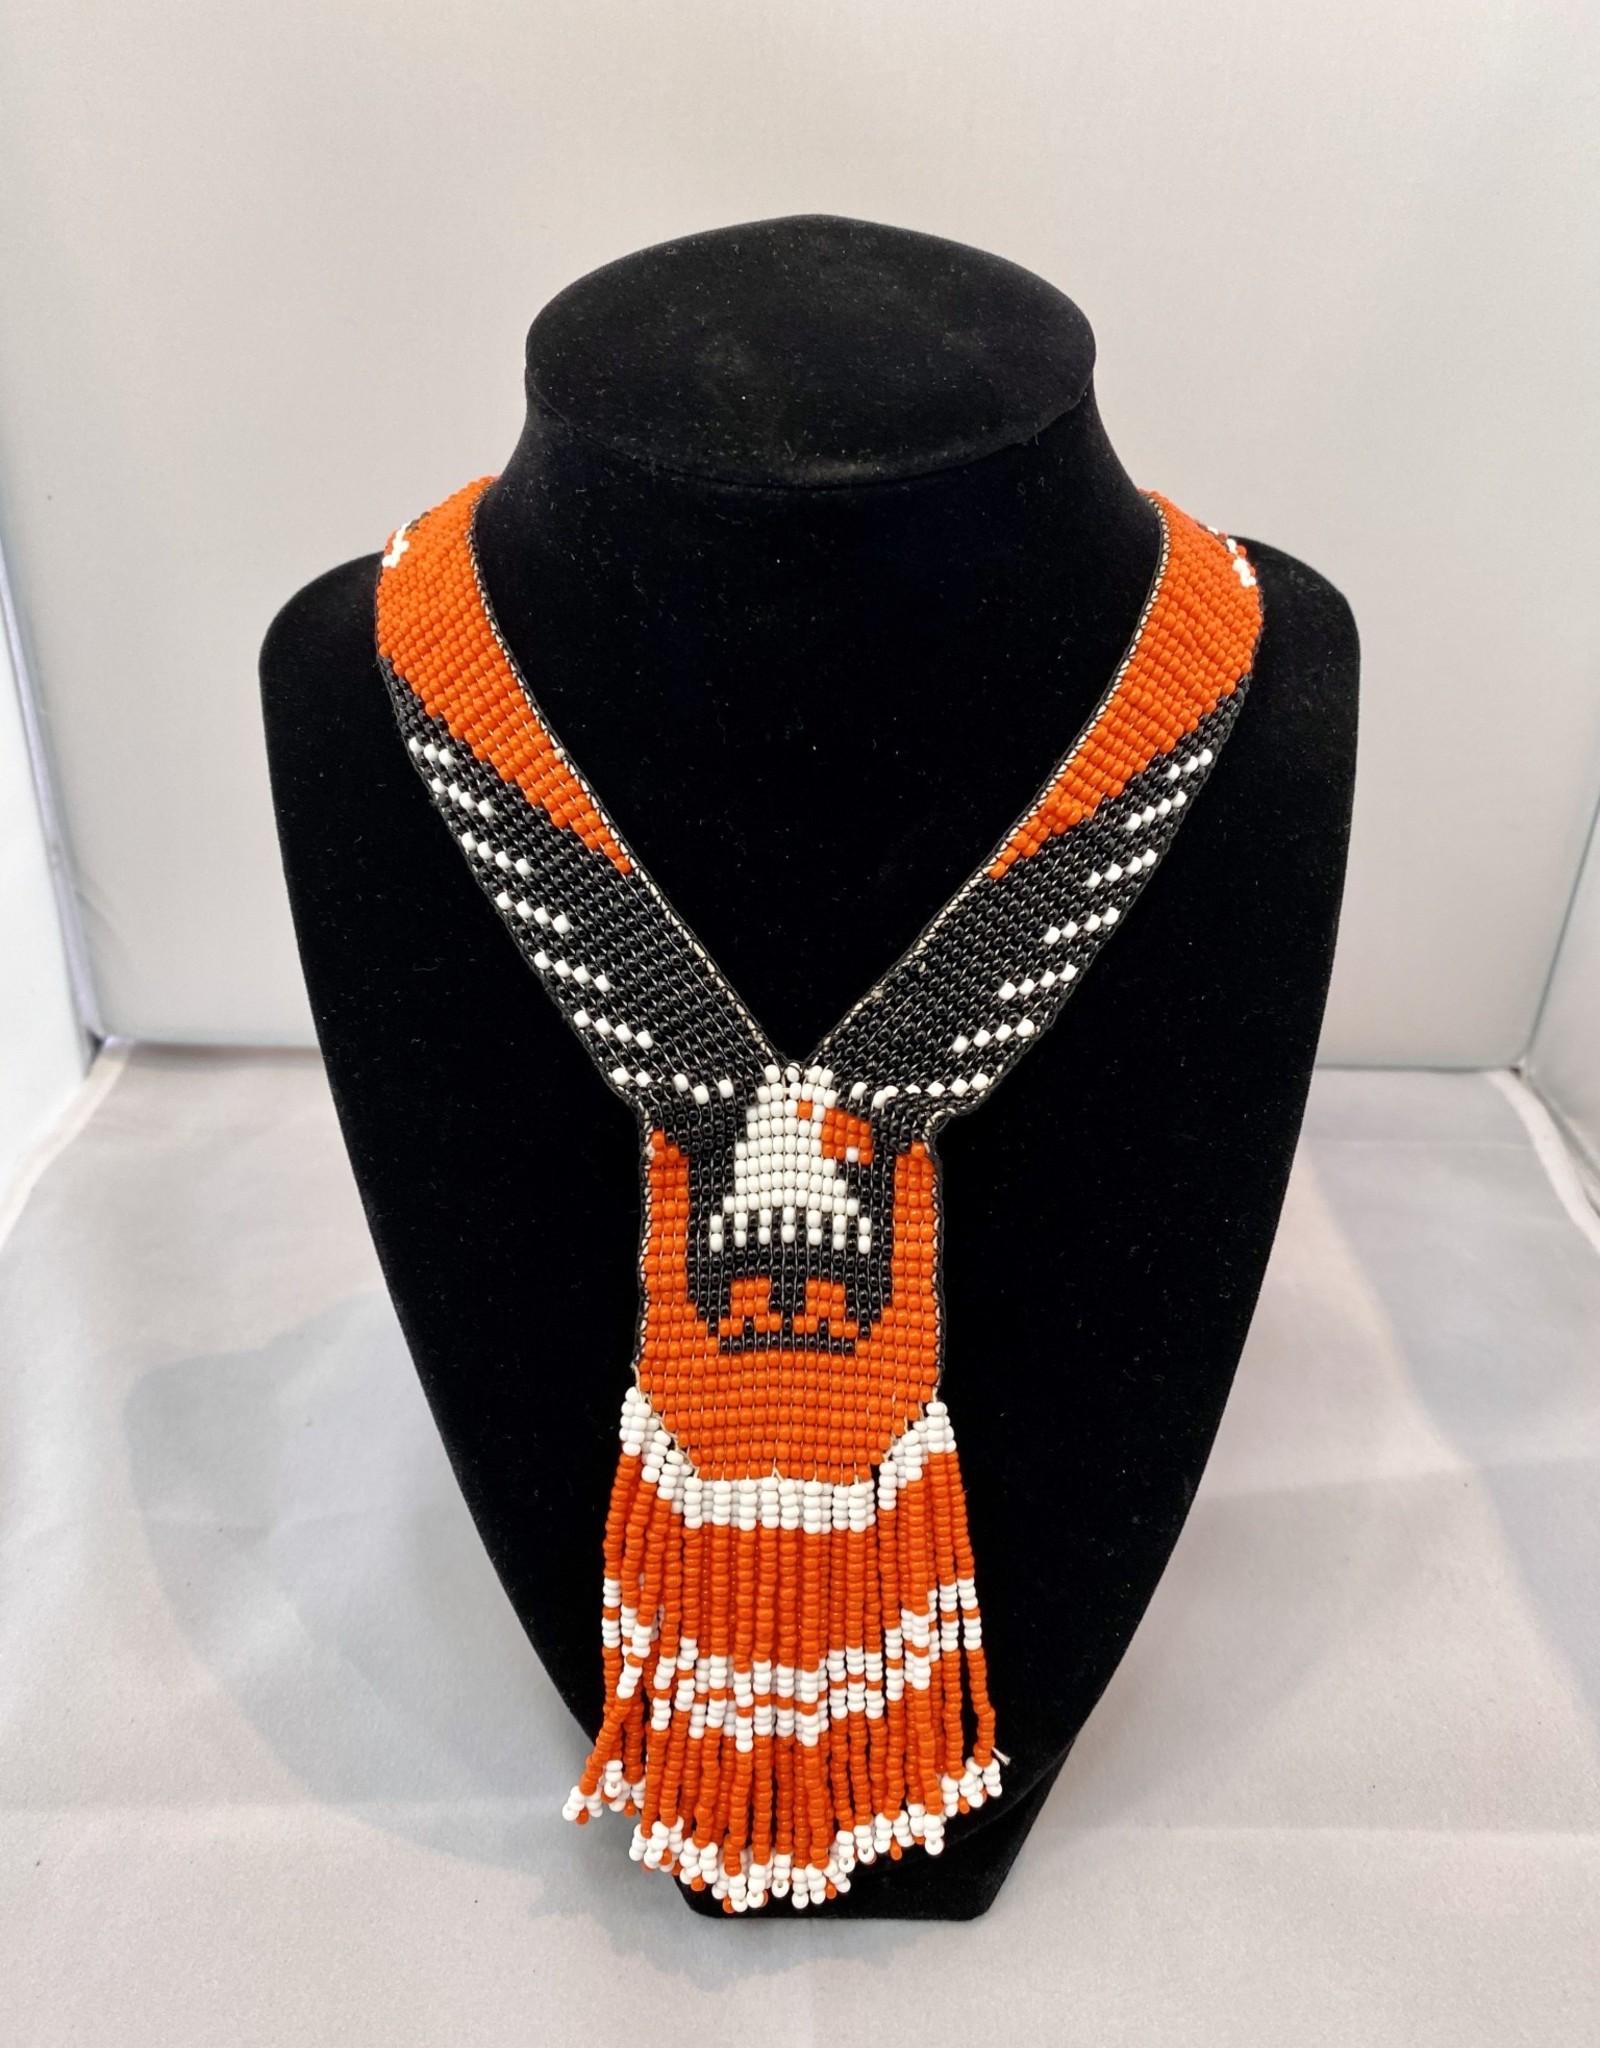 Native Beadwork - Queen Charlottes/Haida Gwaii